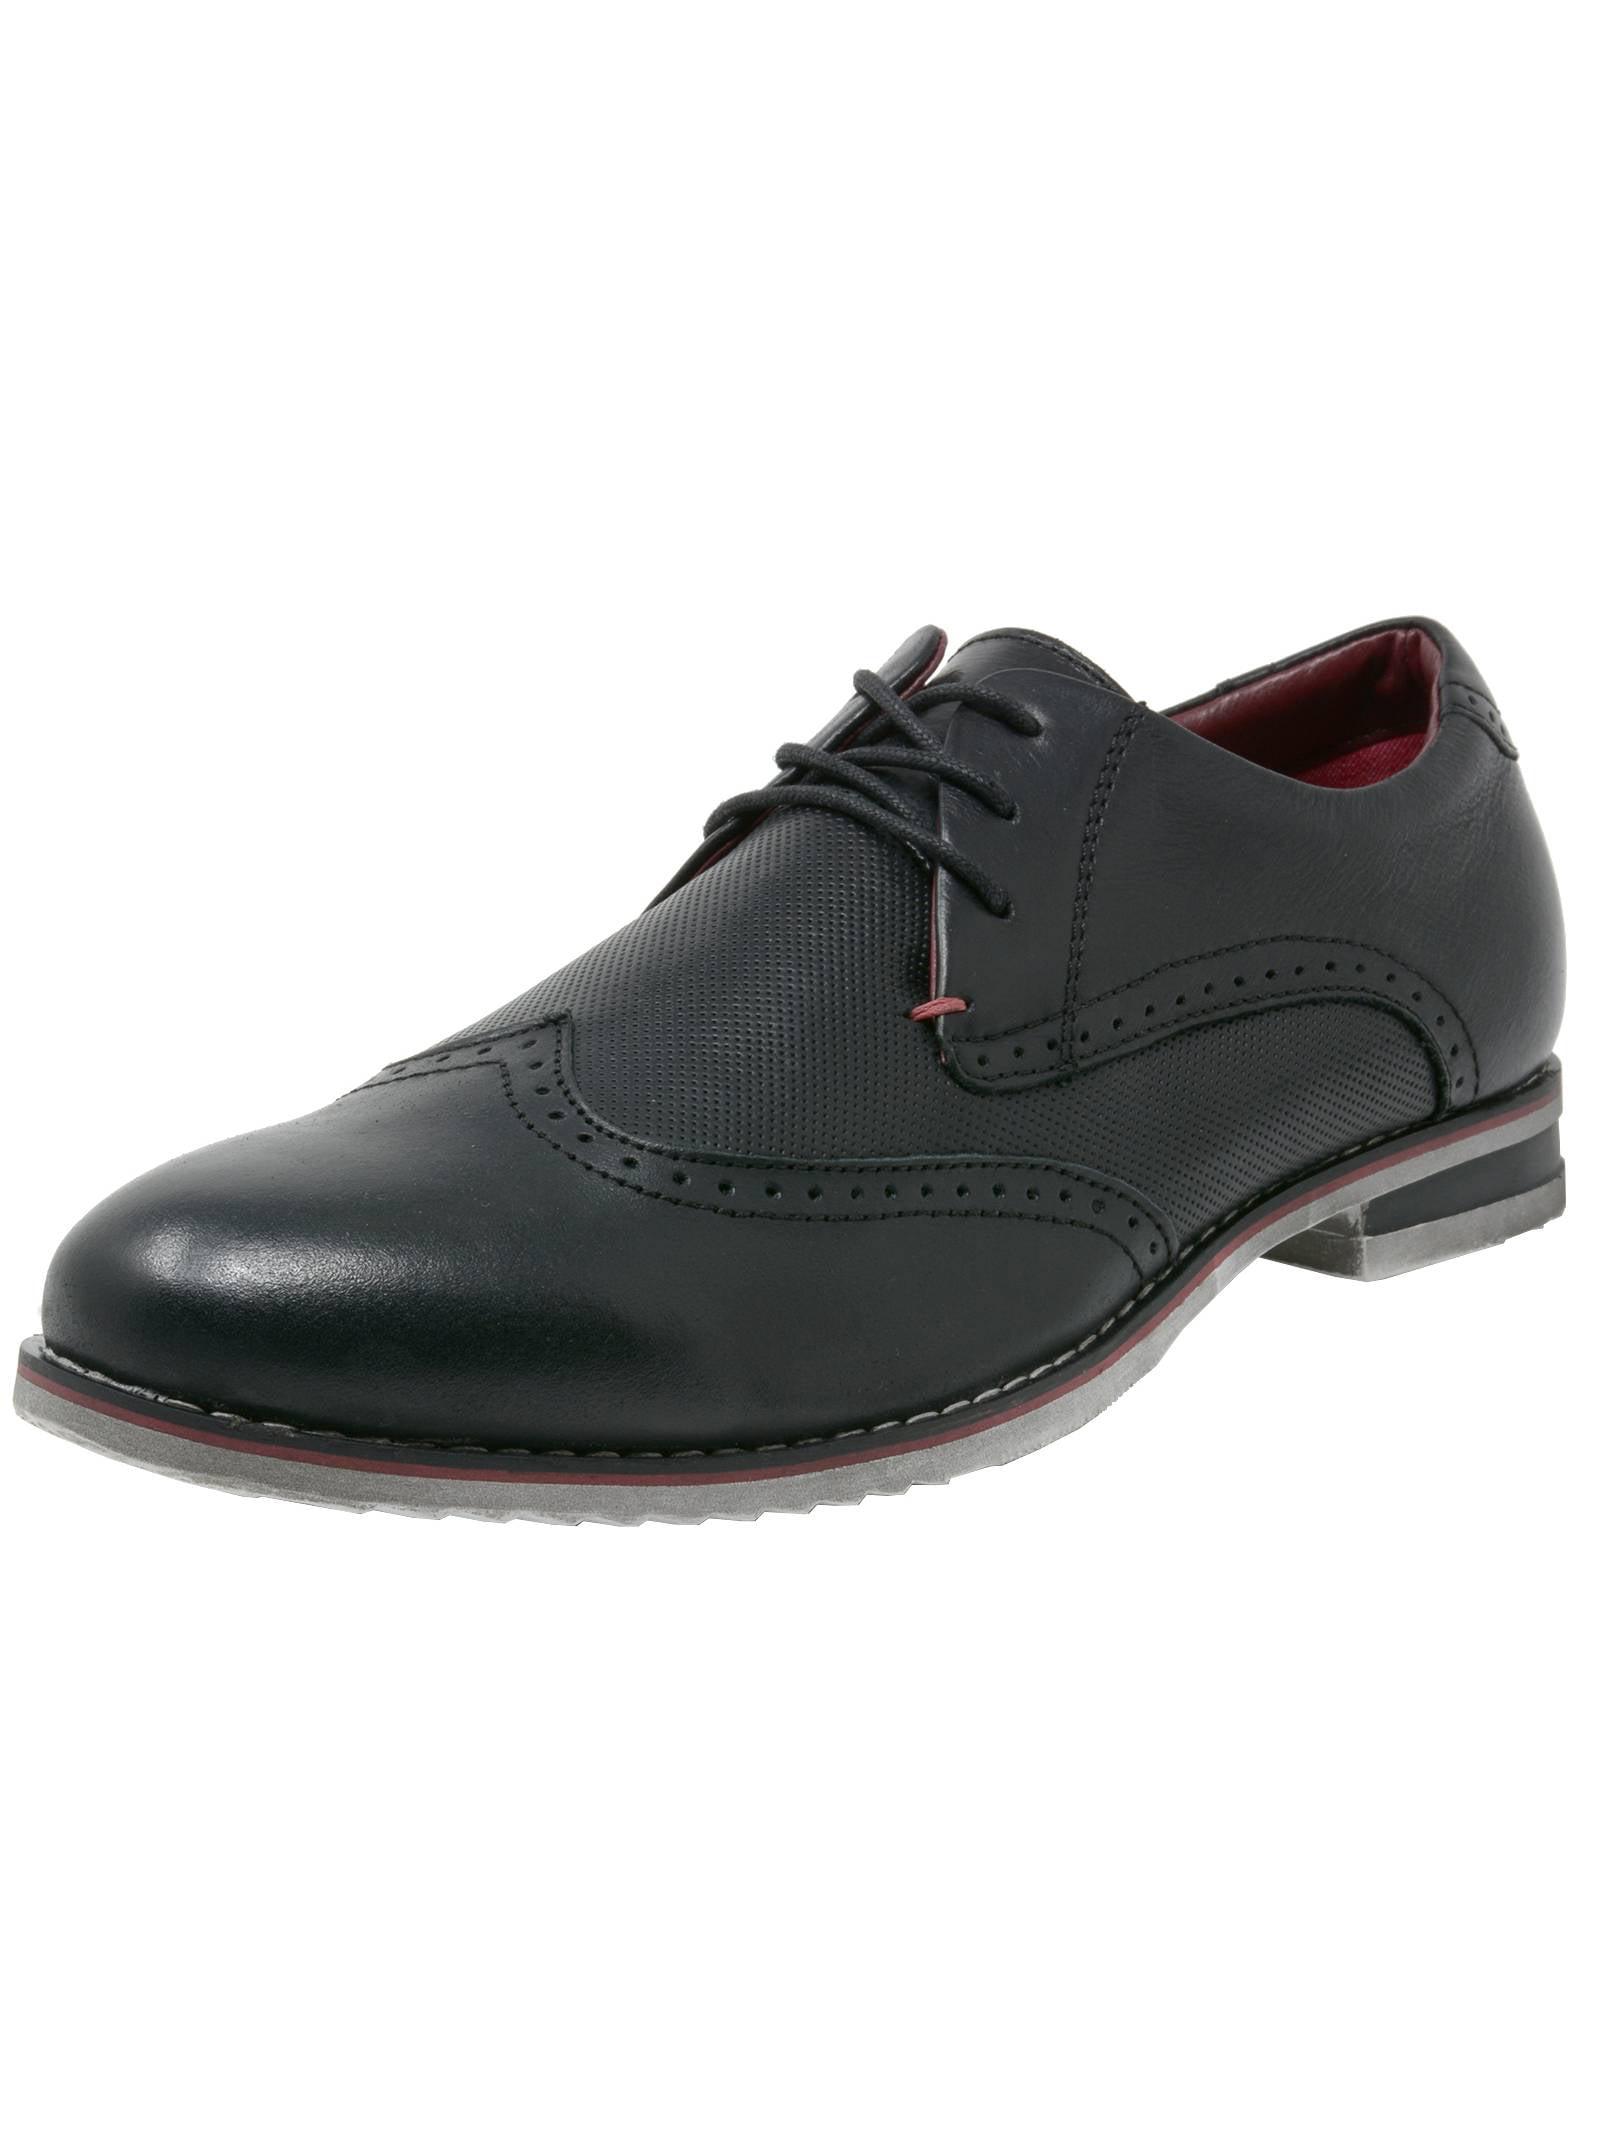 double diamond by alpine swiss mens oxfords genuine leather wingtip dress shoes